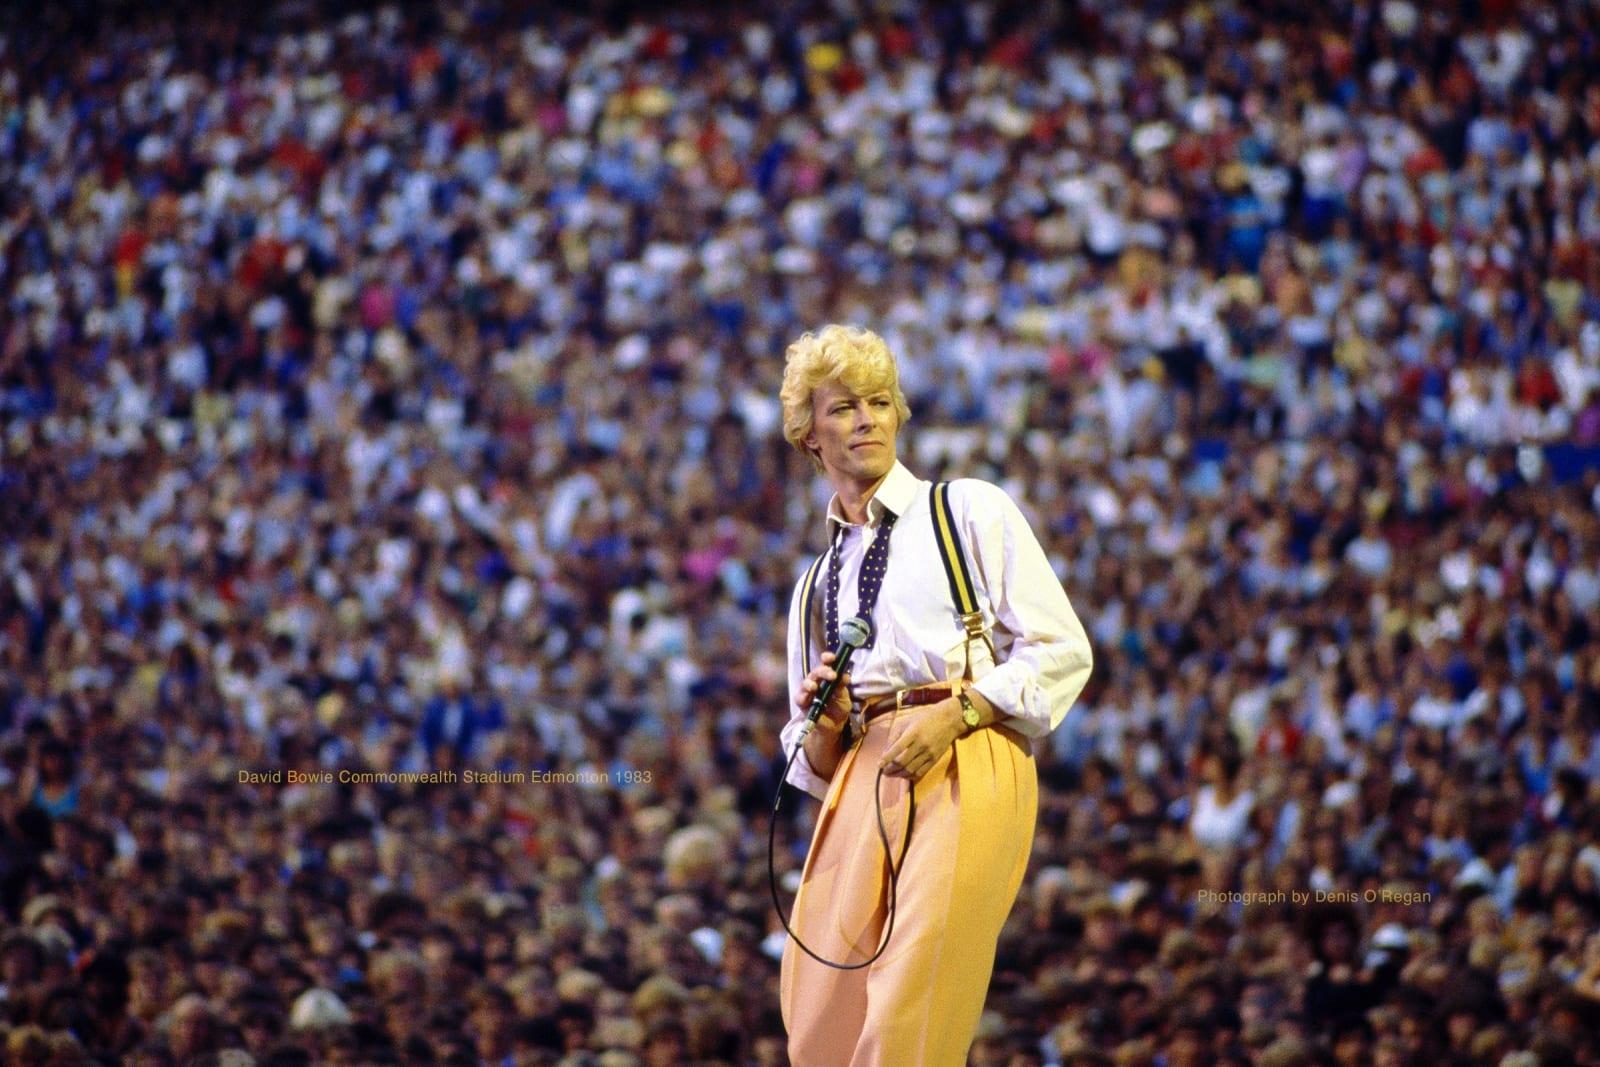 DAVID BOWIE, David Bowie Edmonton, 1983